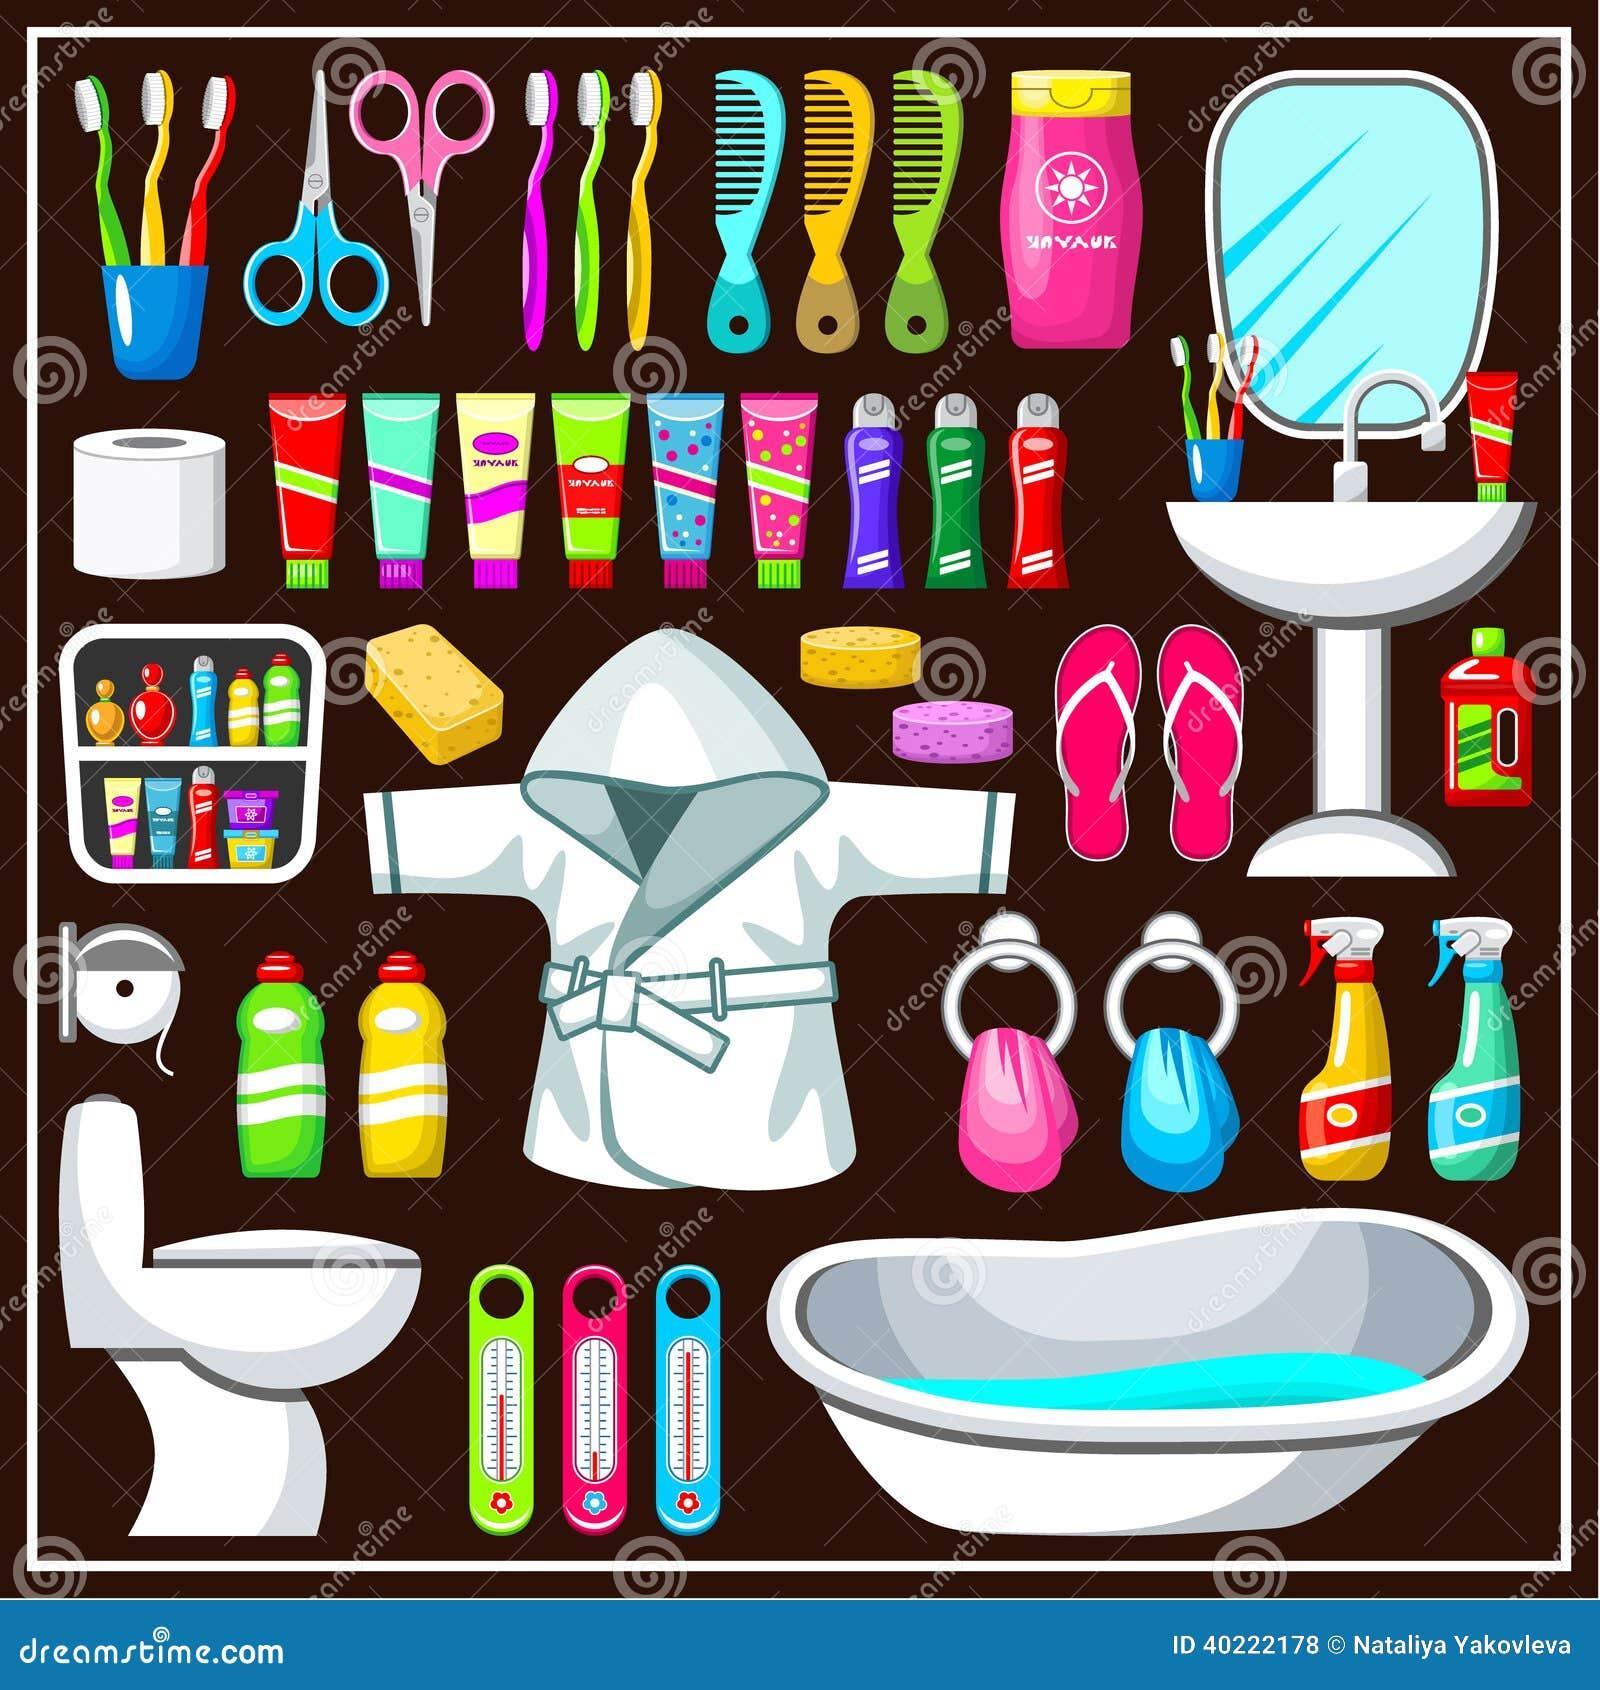 bathroom equipment set stock vector illustration of bowl